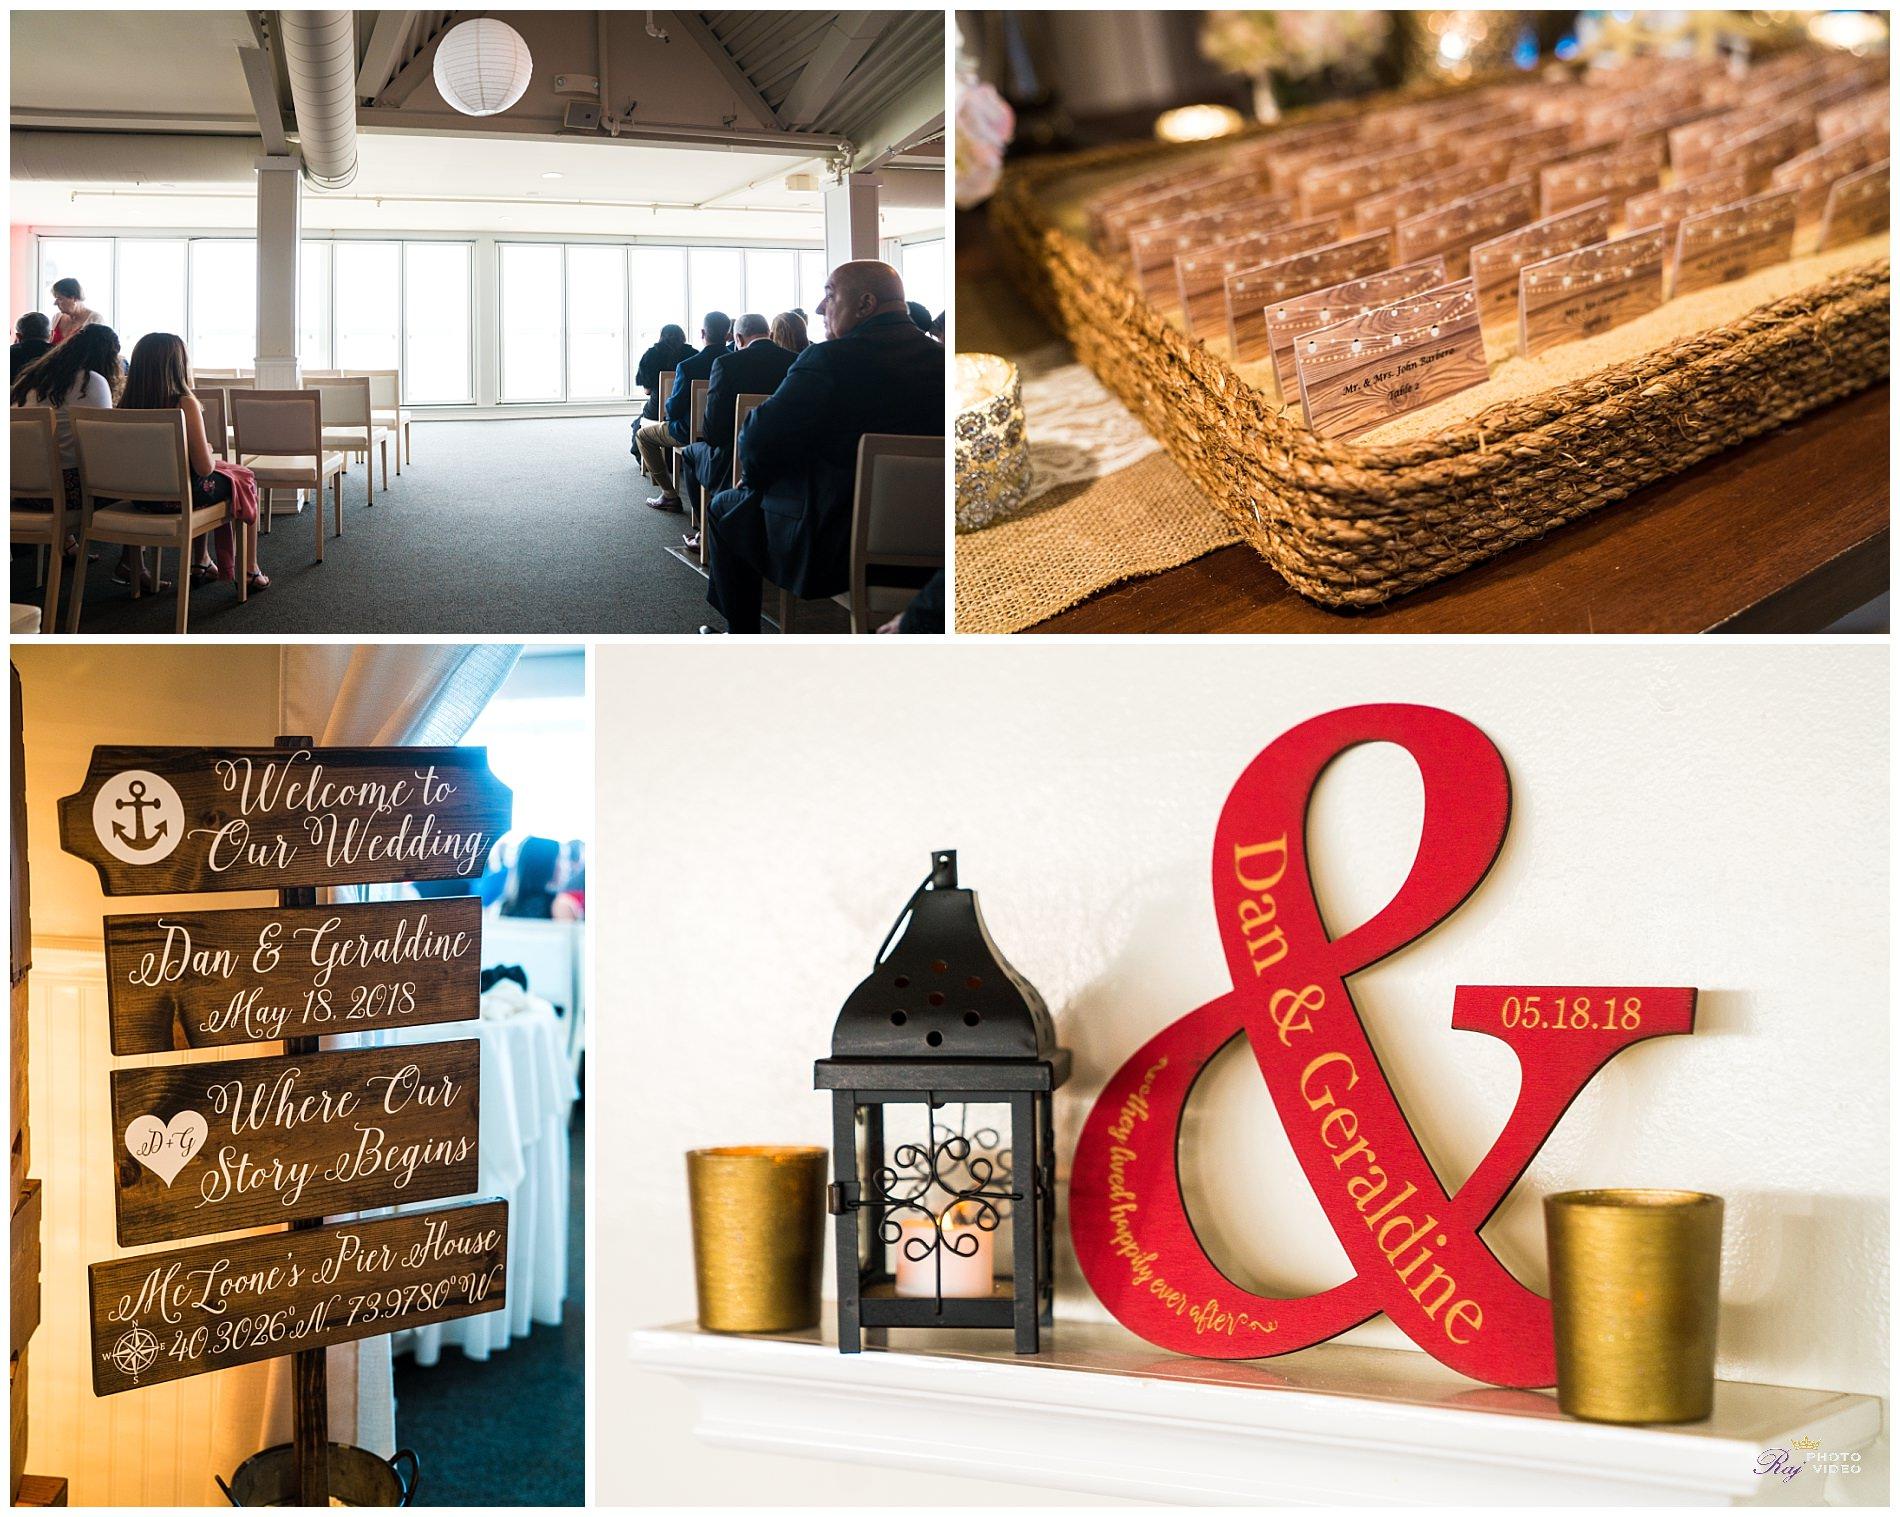 McLoones-Pier-House-Long-Branch-NJ-Wedding-Geraldine-Daniel-1.jpg